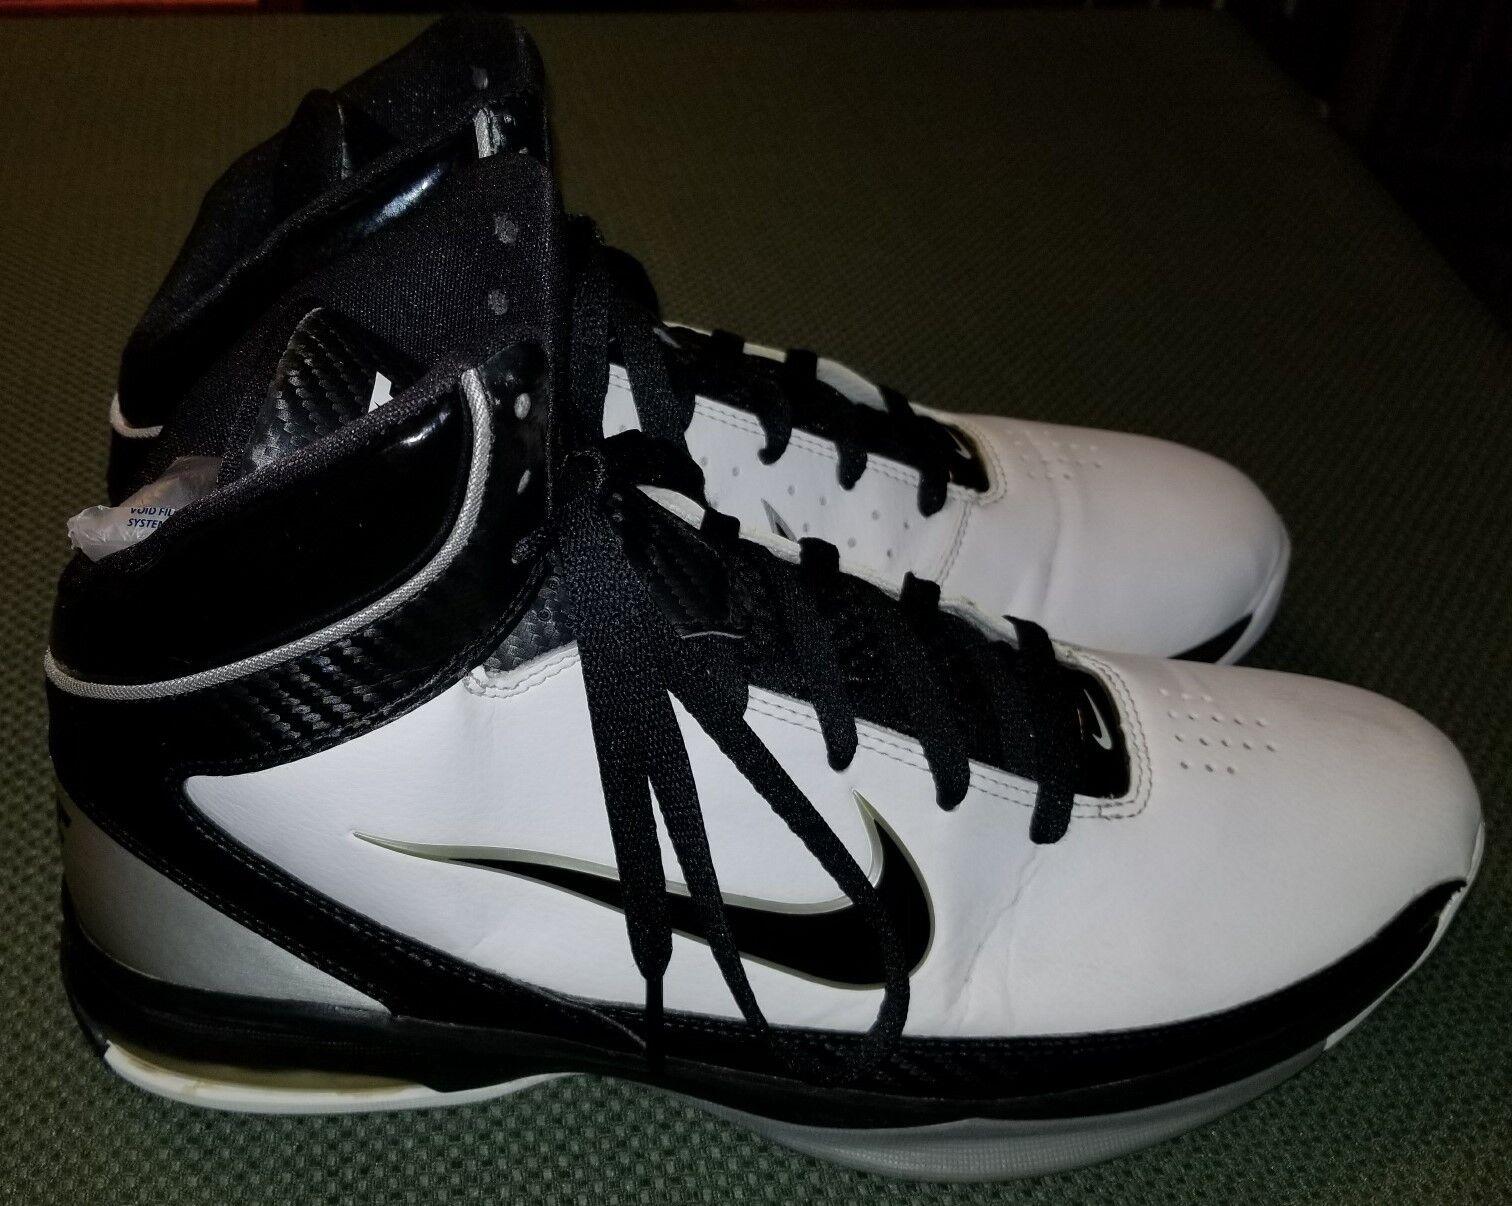 Nike air basket max ostentate bianco nero basket air scarpe taglia uomini noi 11 usata 82d630